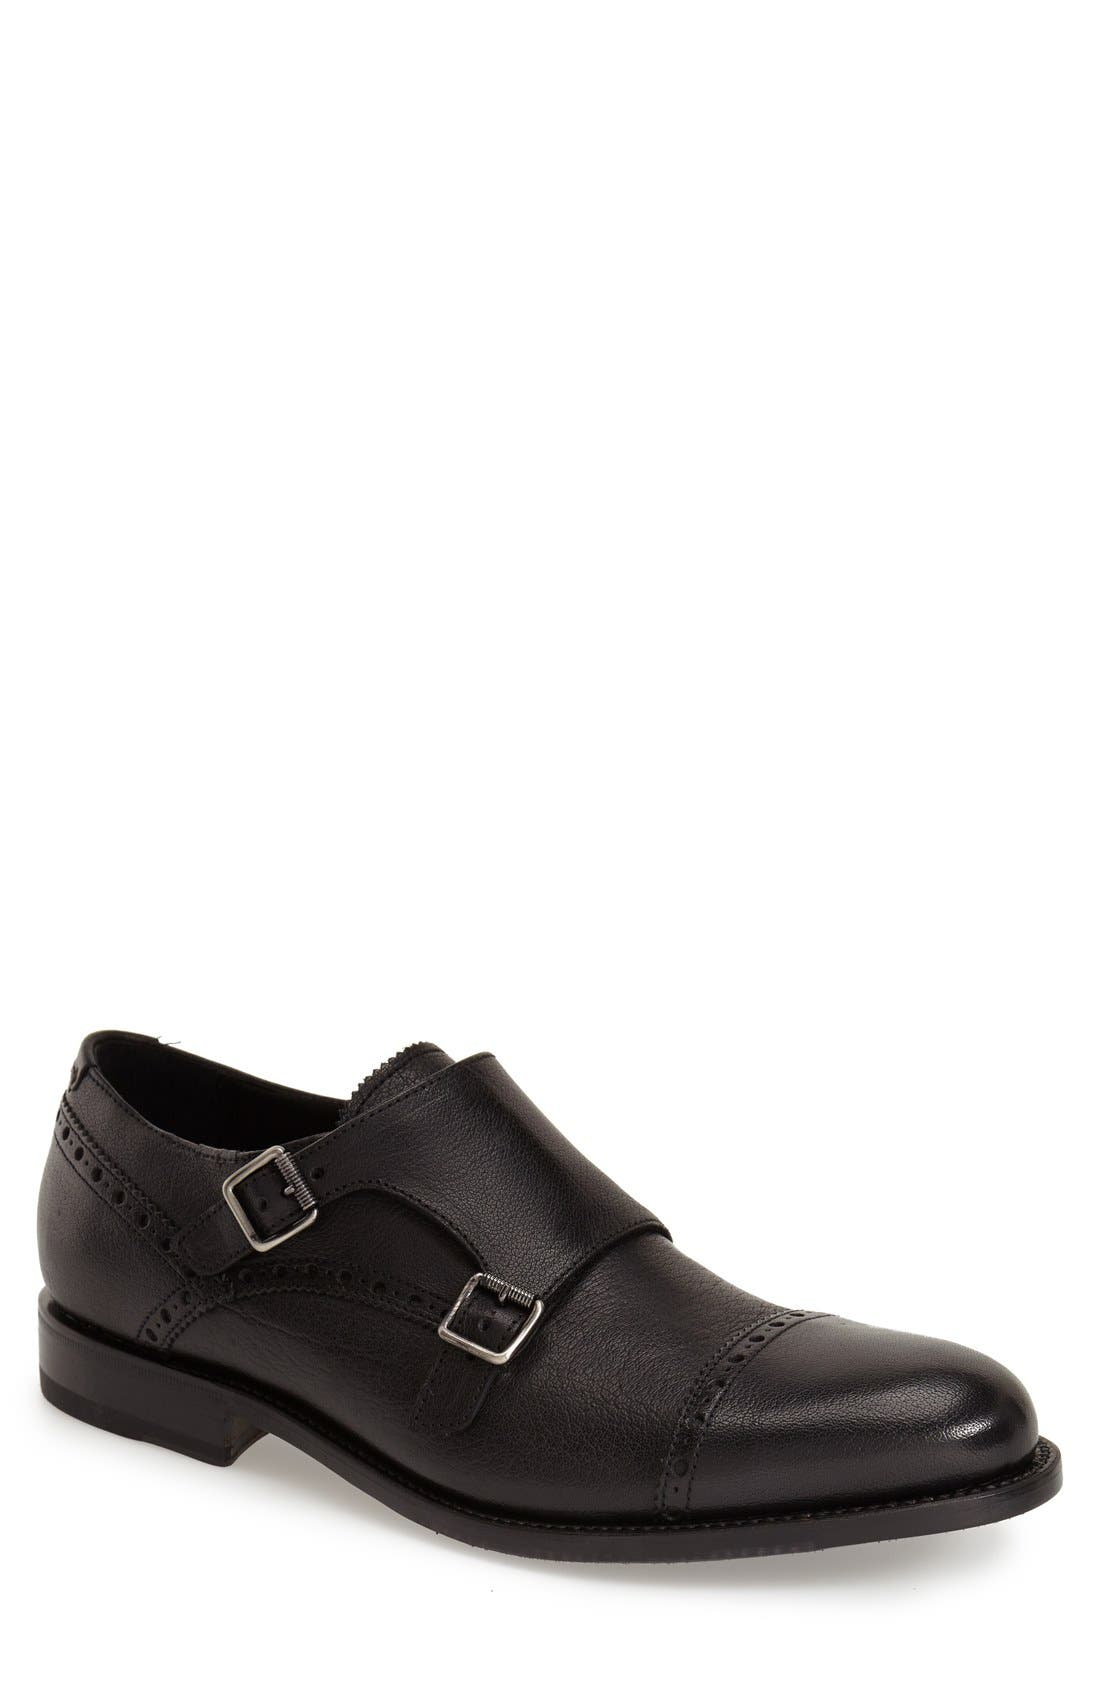 'Fallon' Weatherproof Monk Strap Shoe,                         Main,                         color, 001